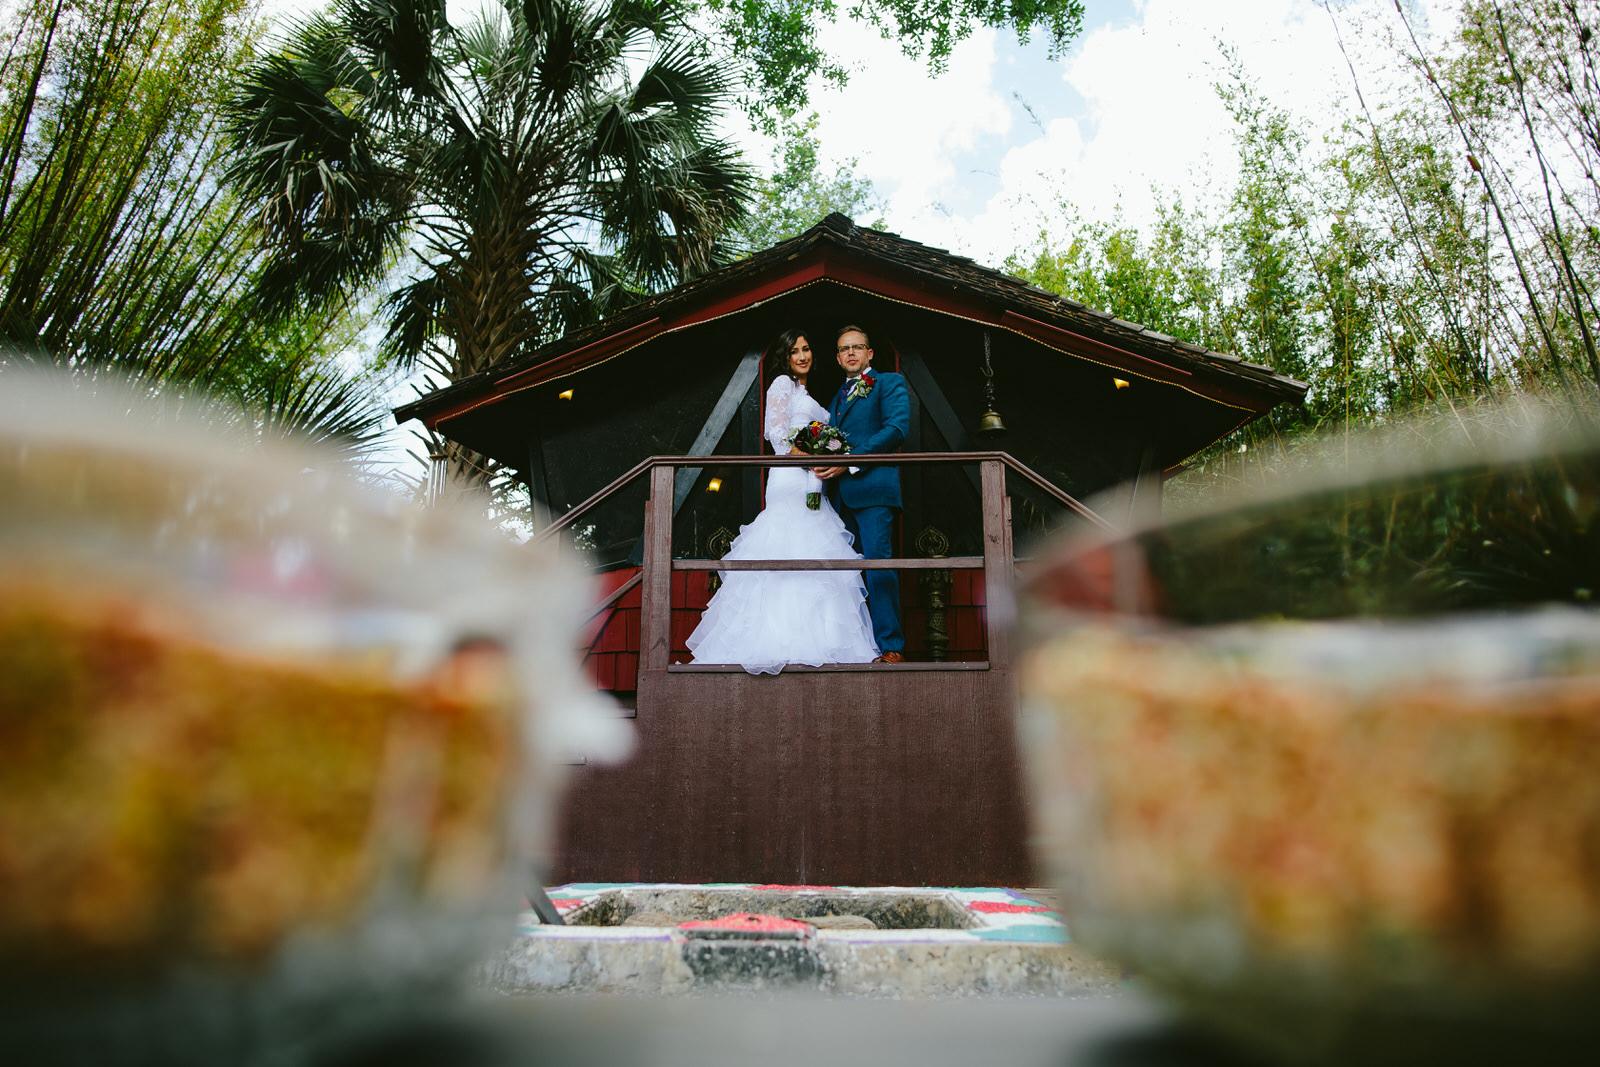 kashi-wedding-portraits-bride-and-groom-tiny-house-photo-weddings.jpg